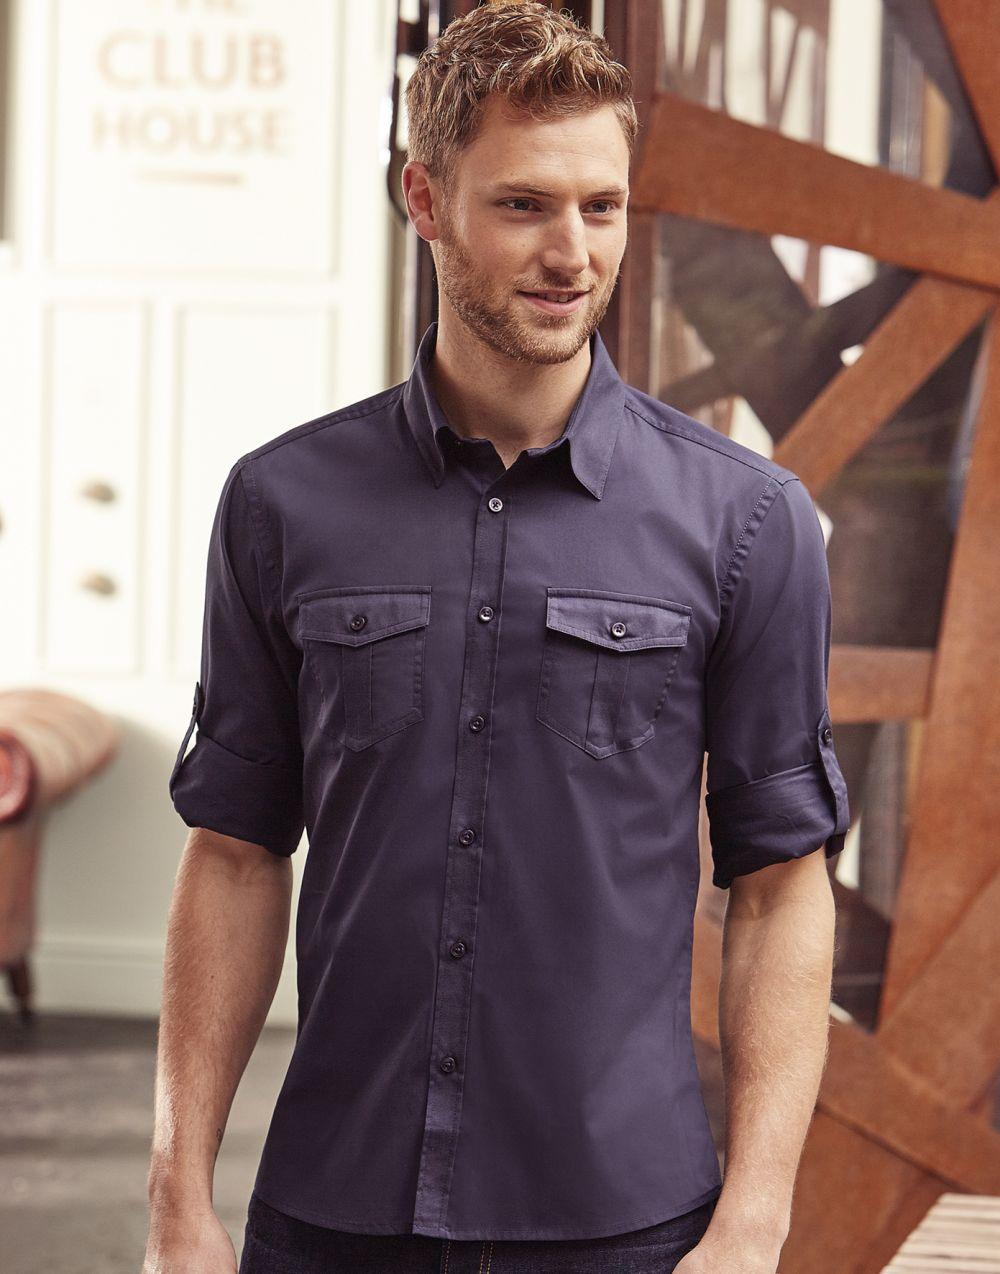 Camisas manga larga russell manga arremangada con bolsillos hombre imagen 6